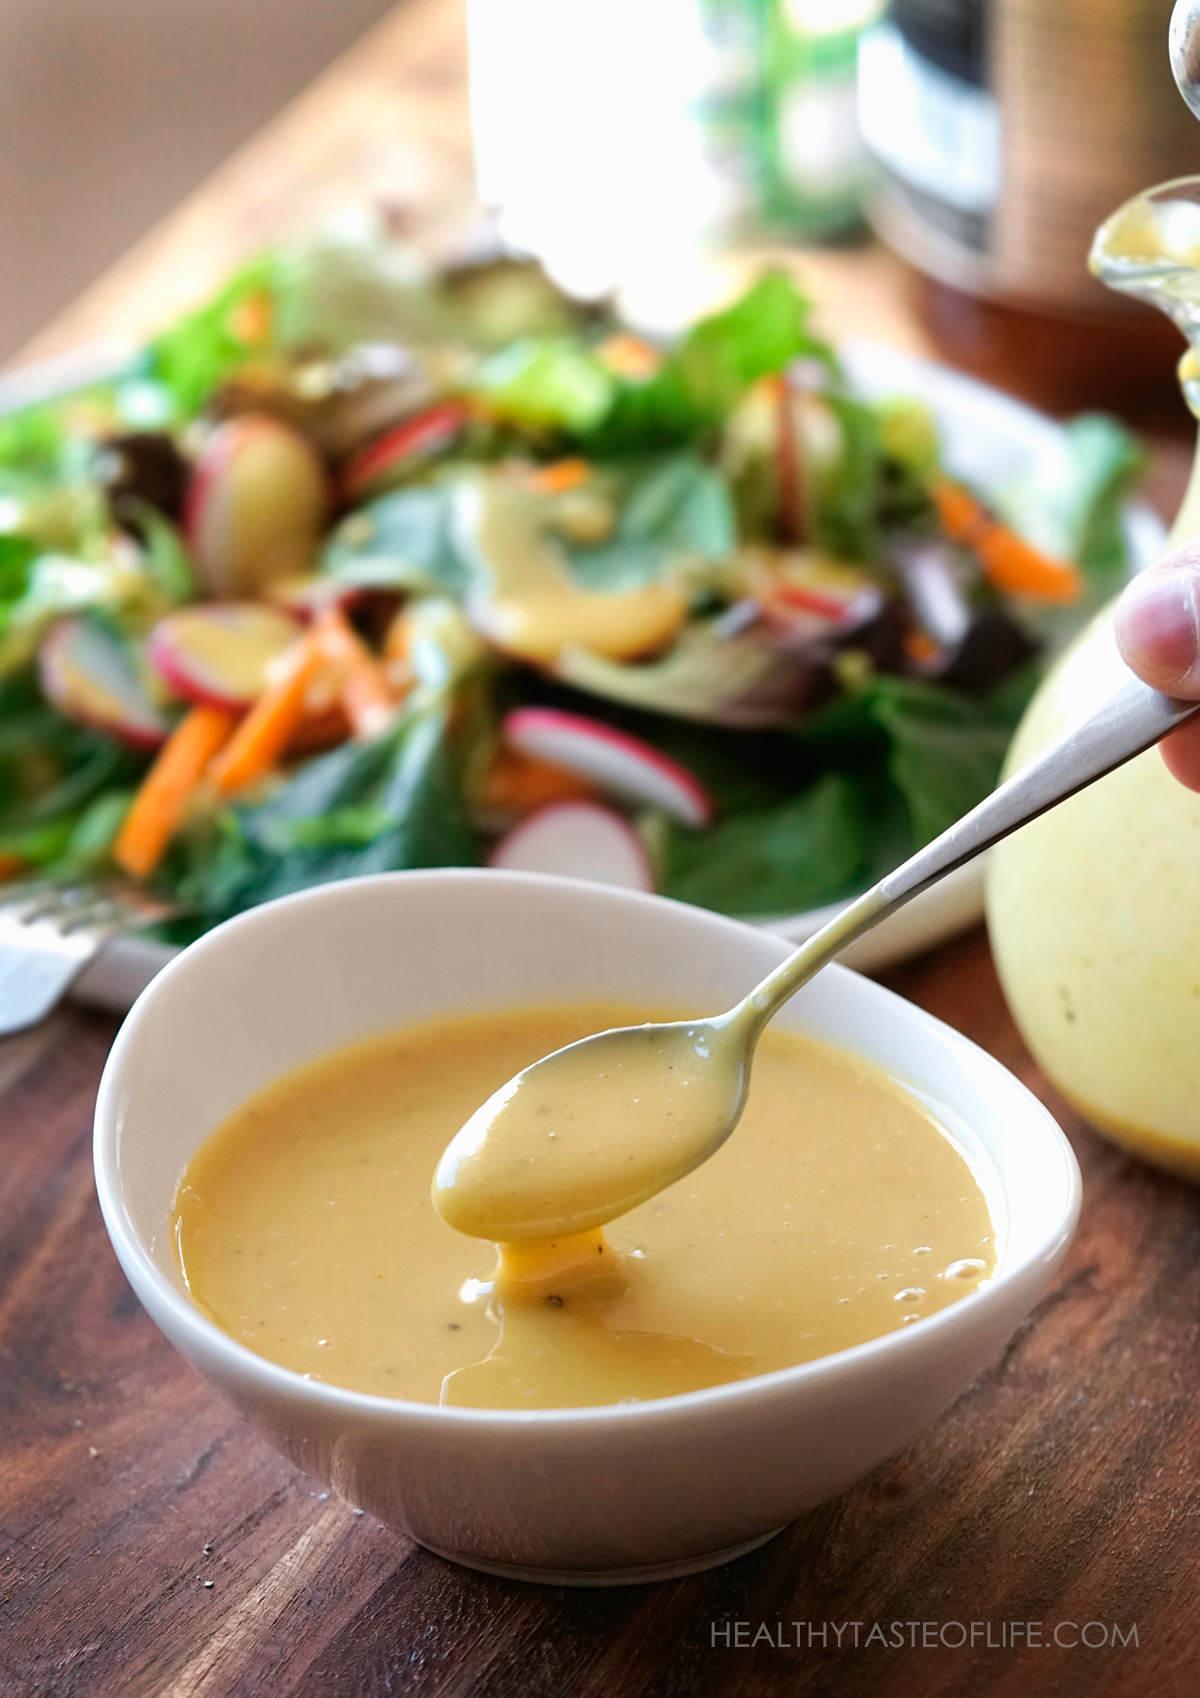 Vegan honey mustard sauce or dressing in bowl.